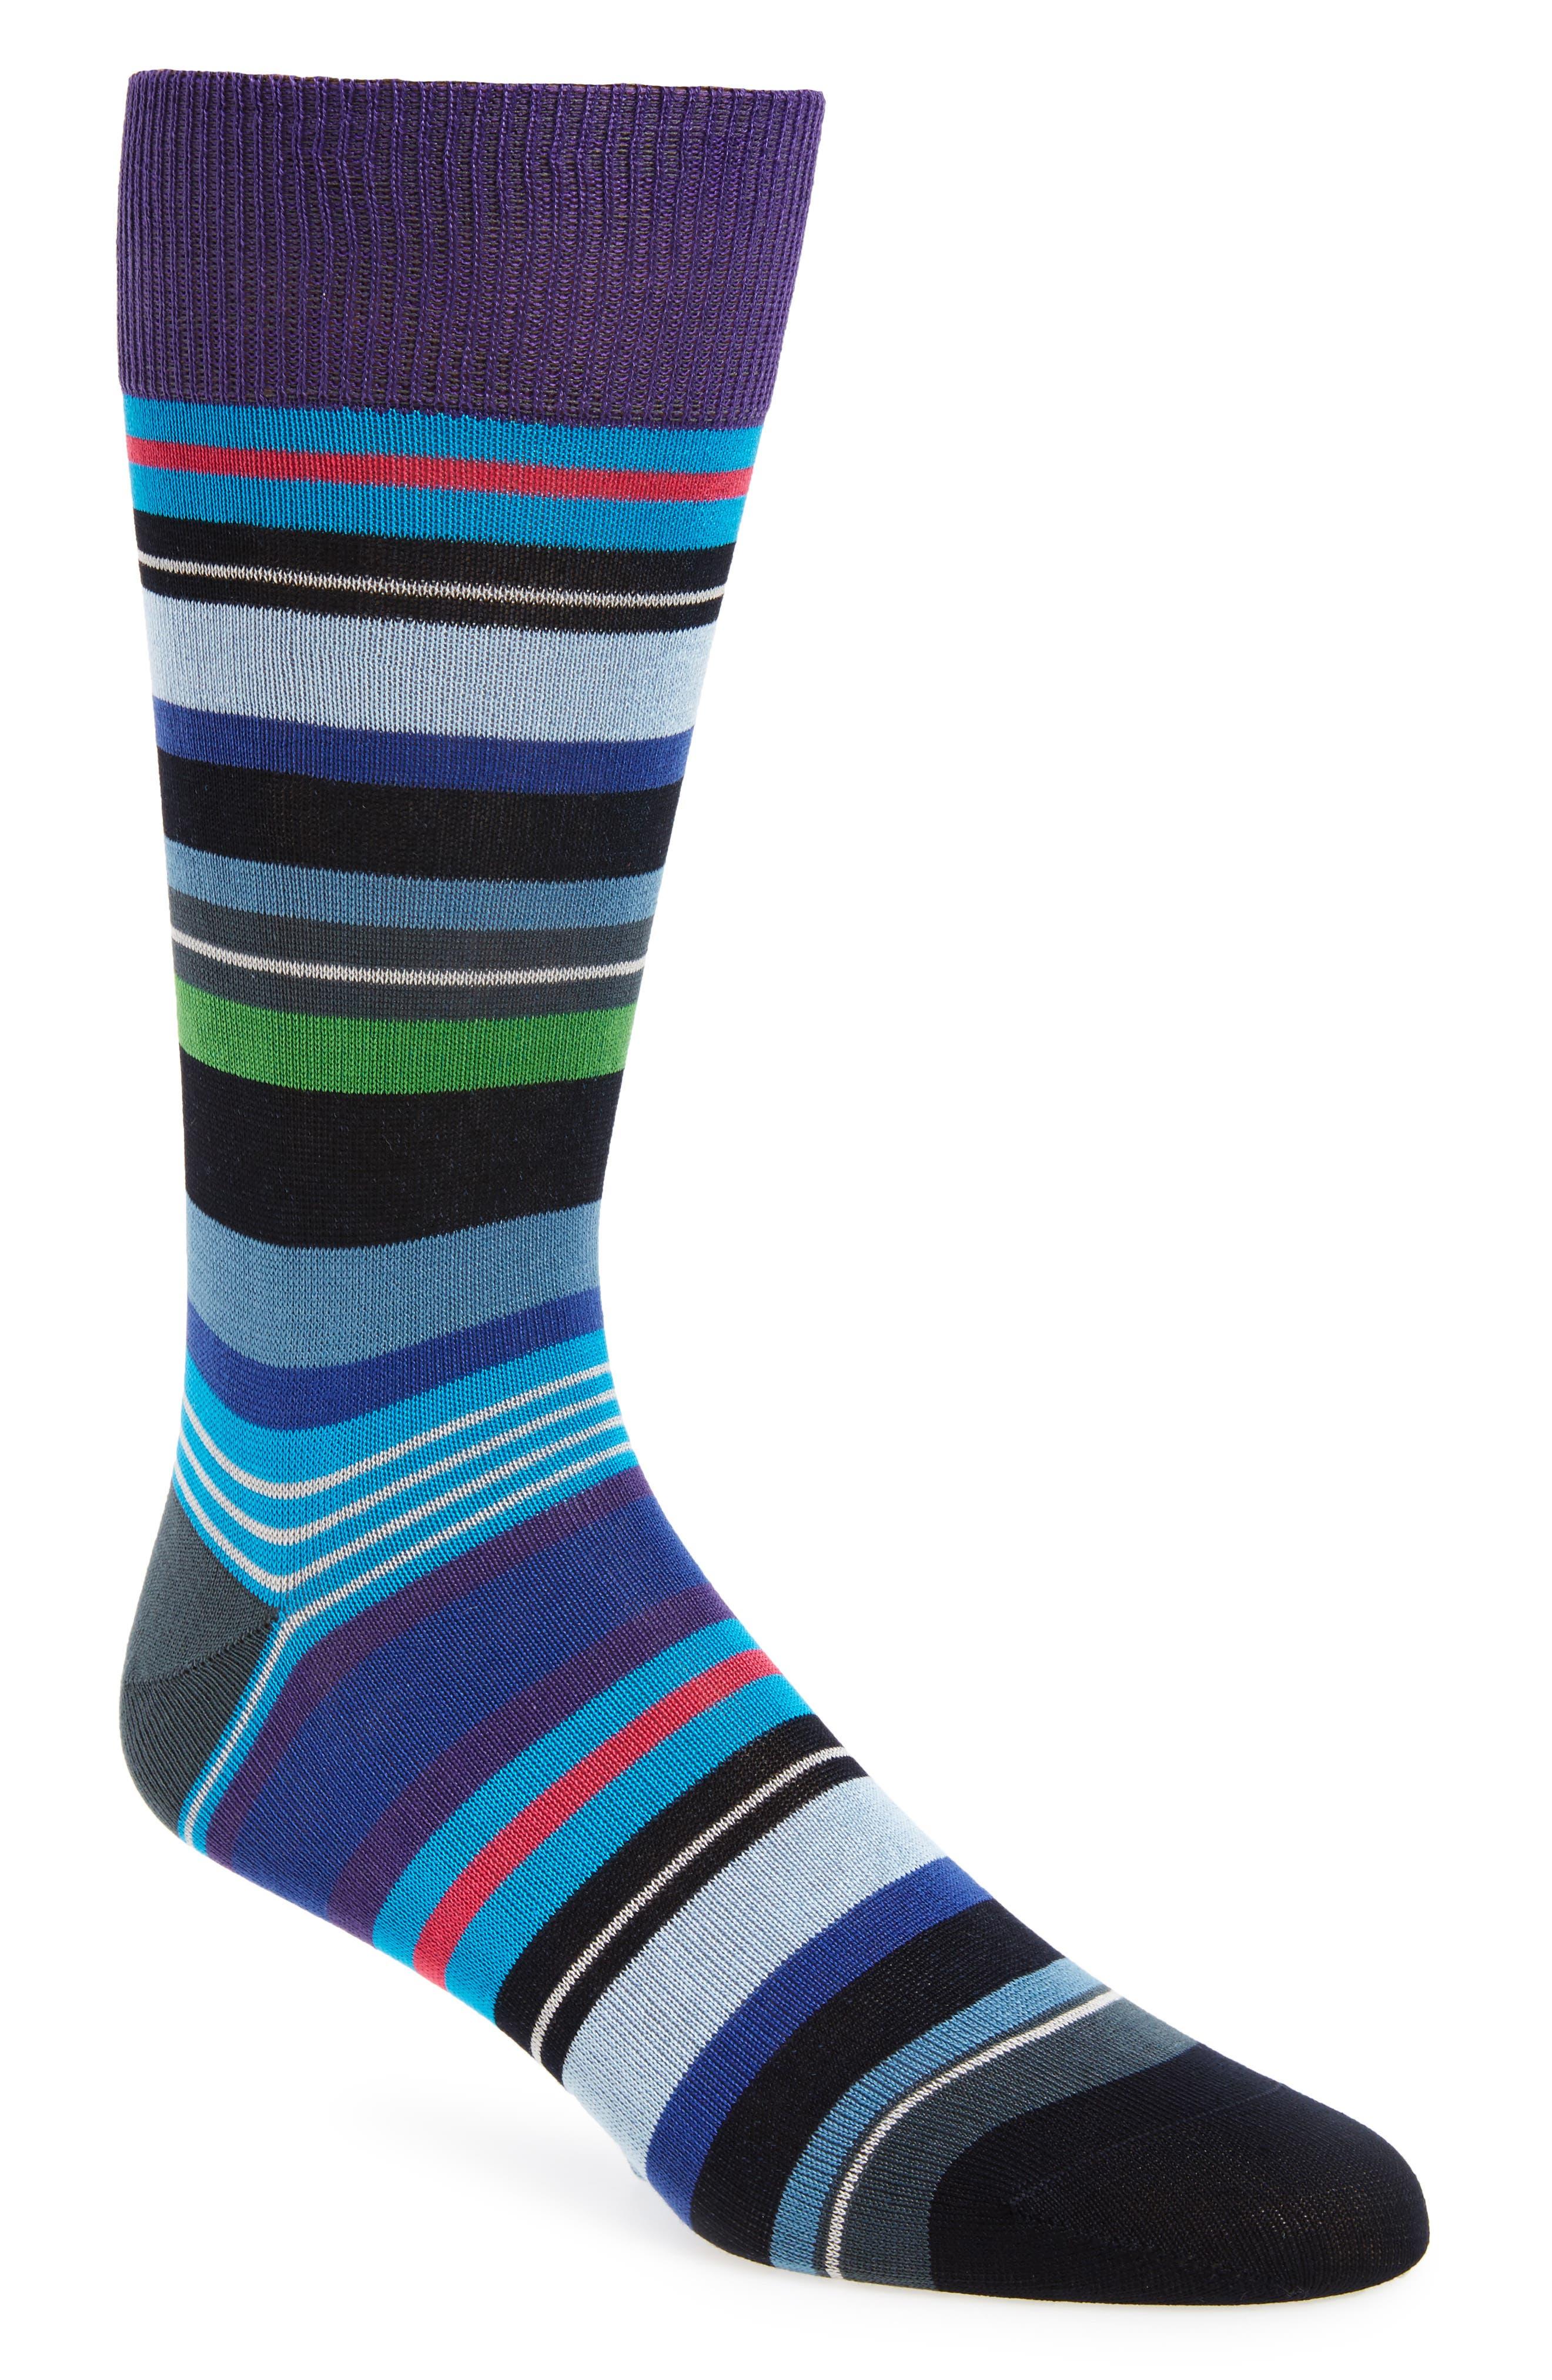 Alternate Image 1 Selected - Paul Smith Halentoe Stripe Socks